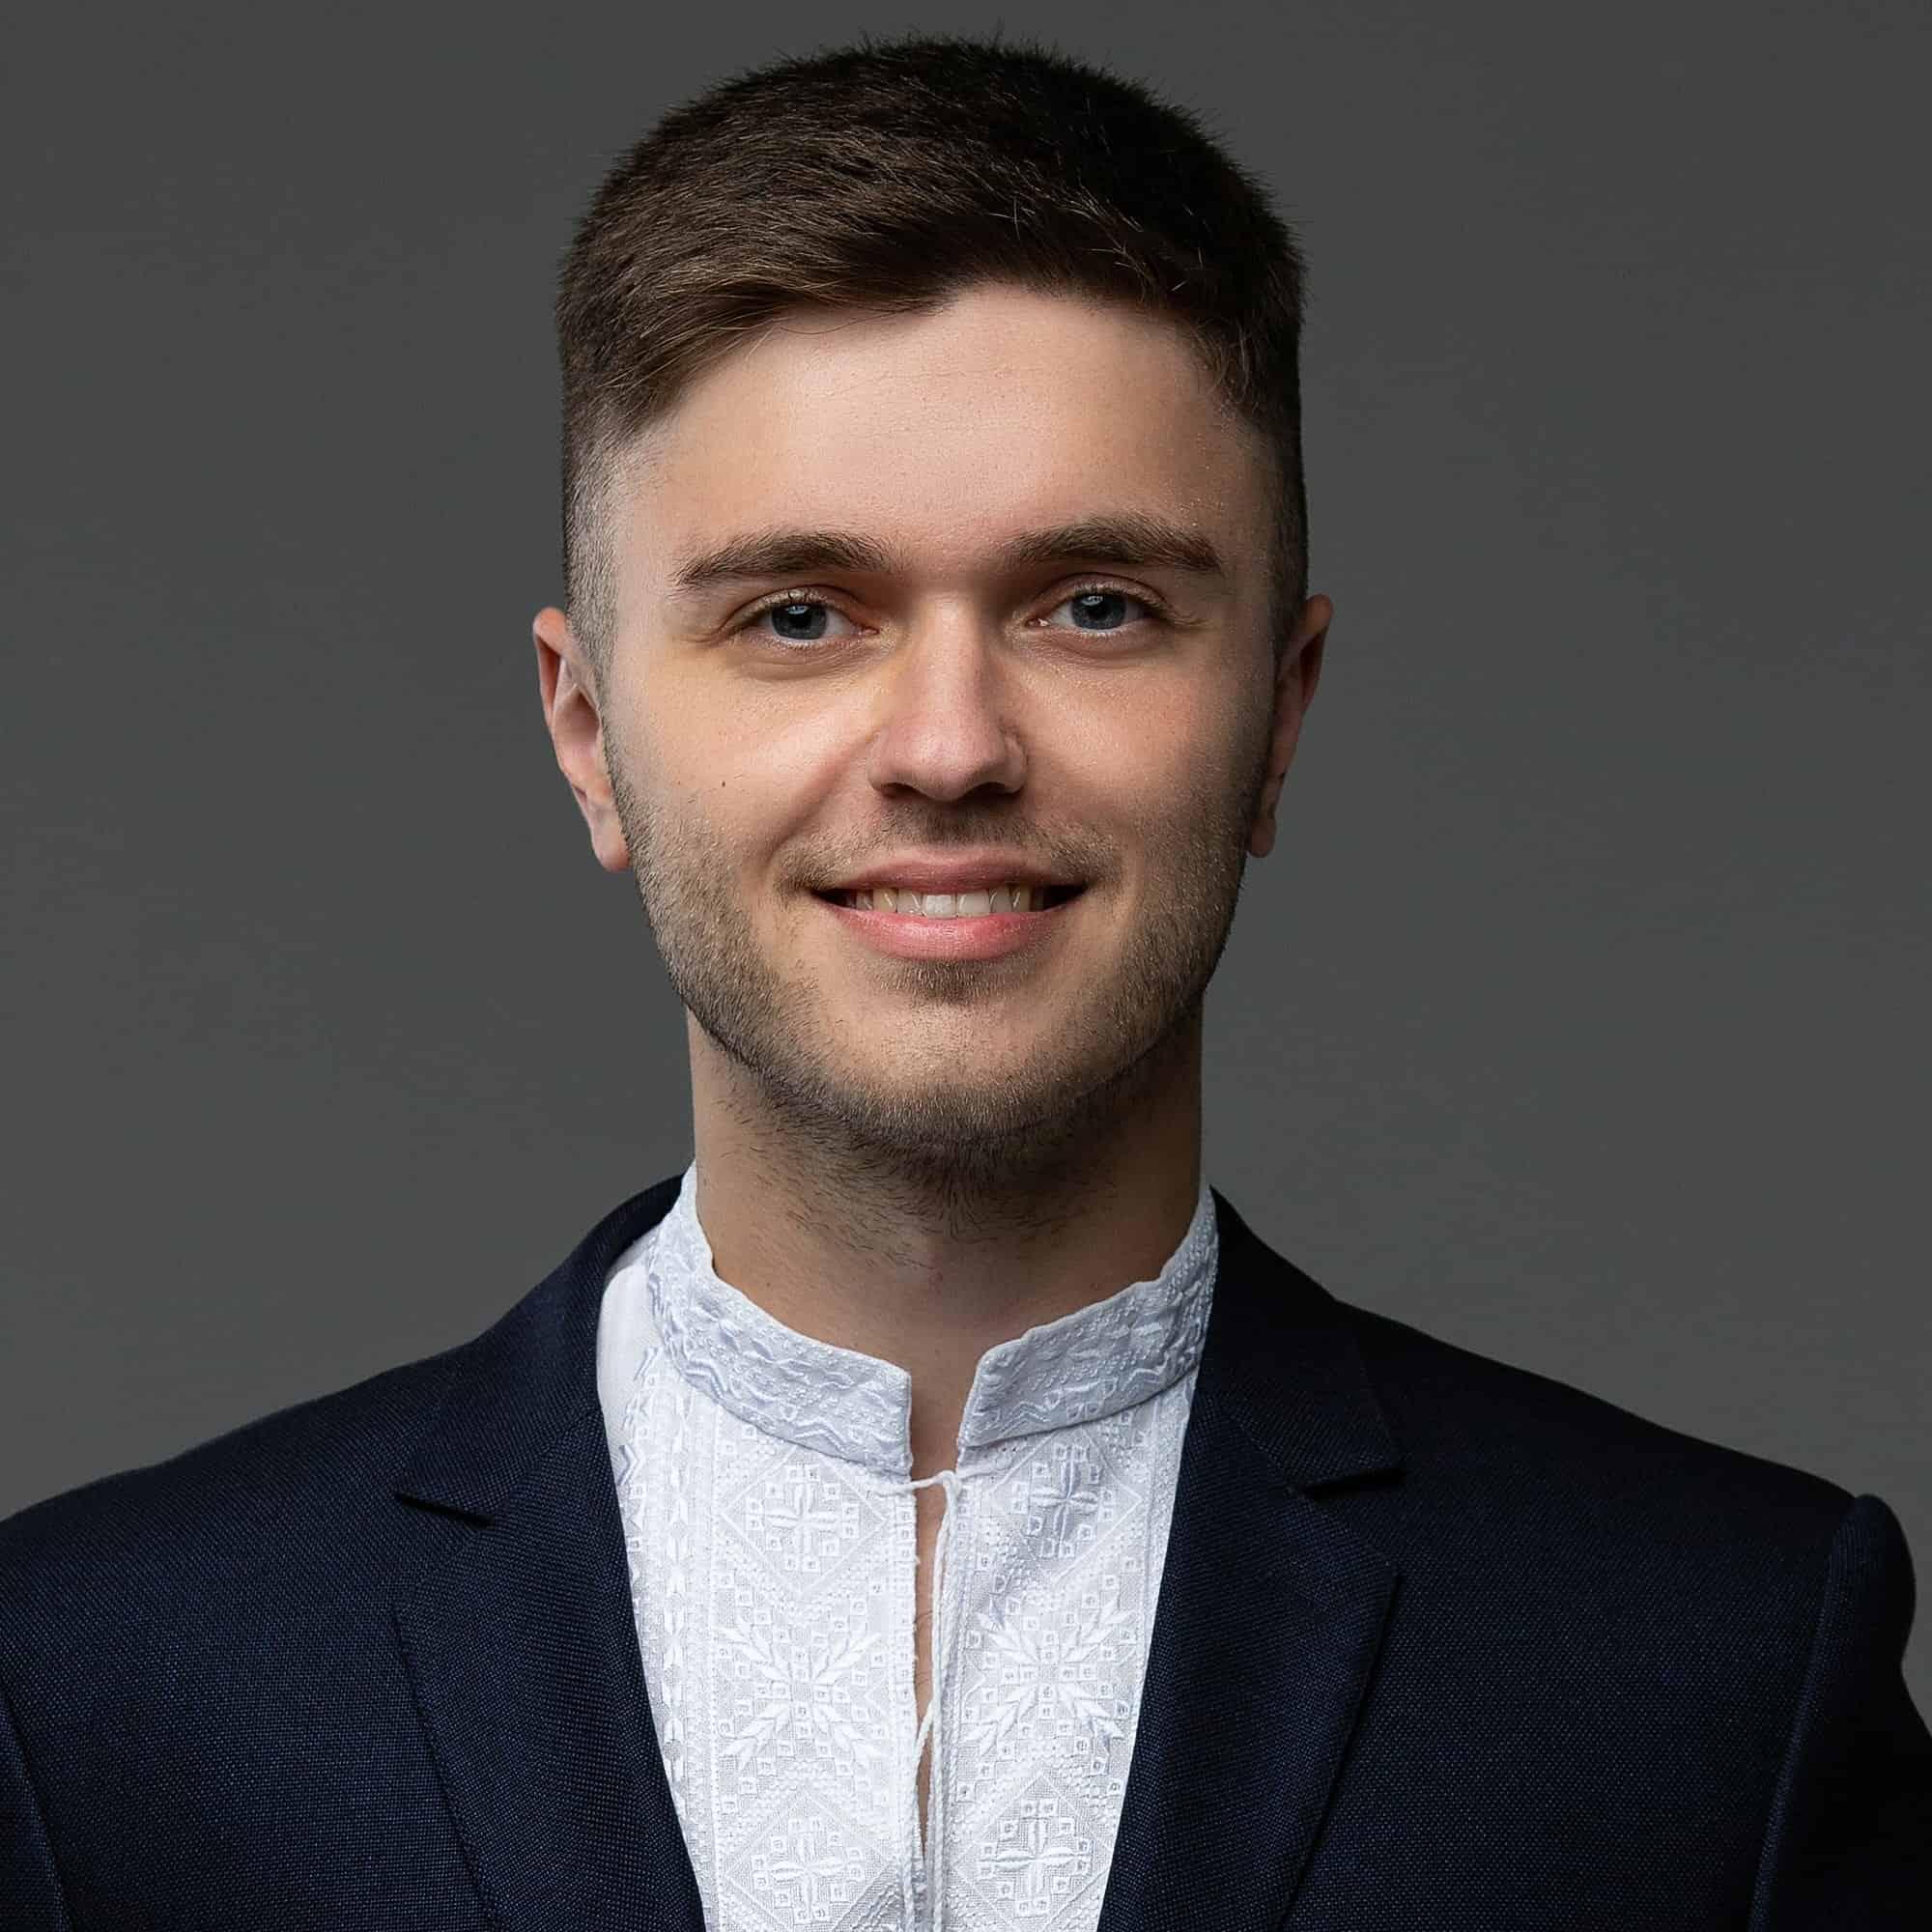 Vitaliy Yaremchuk